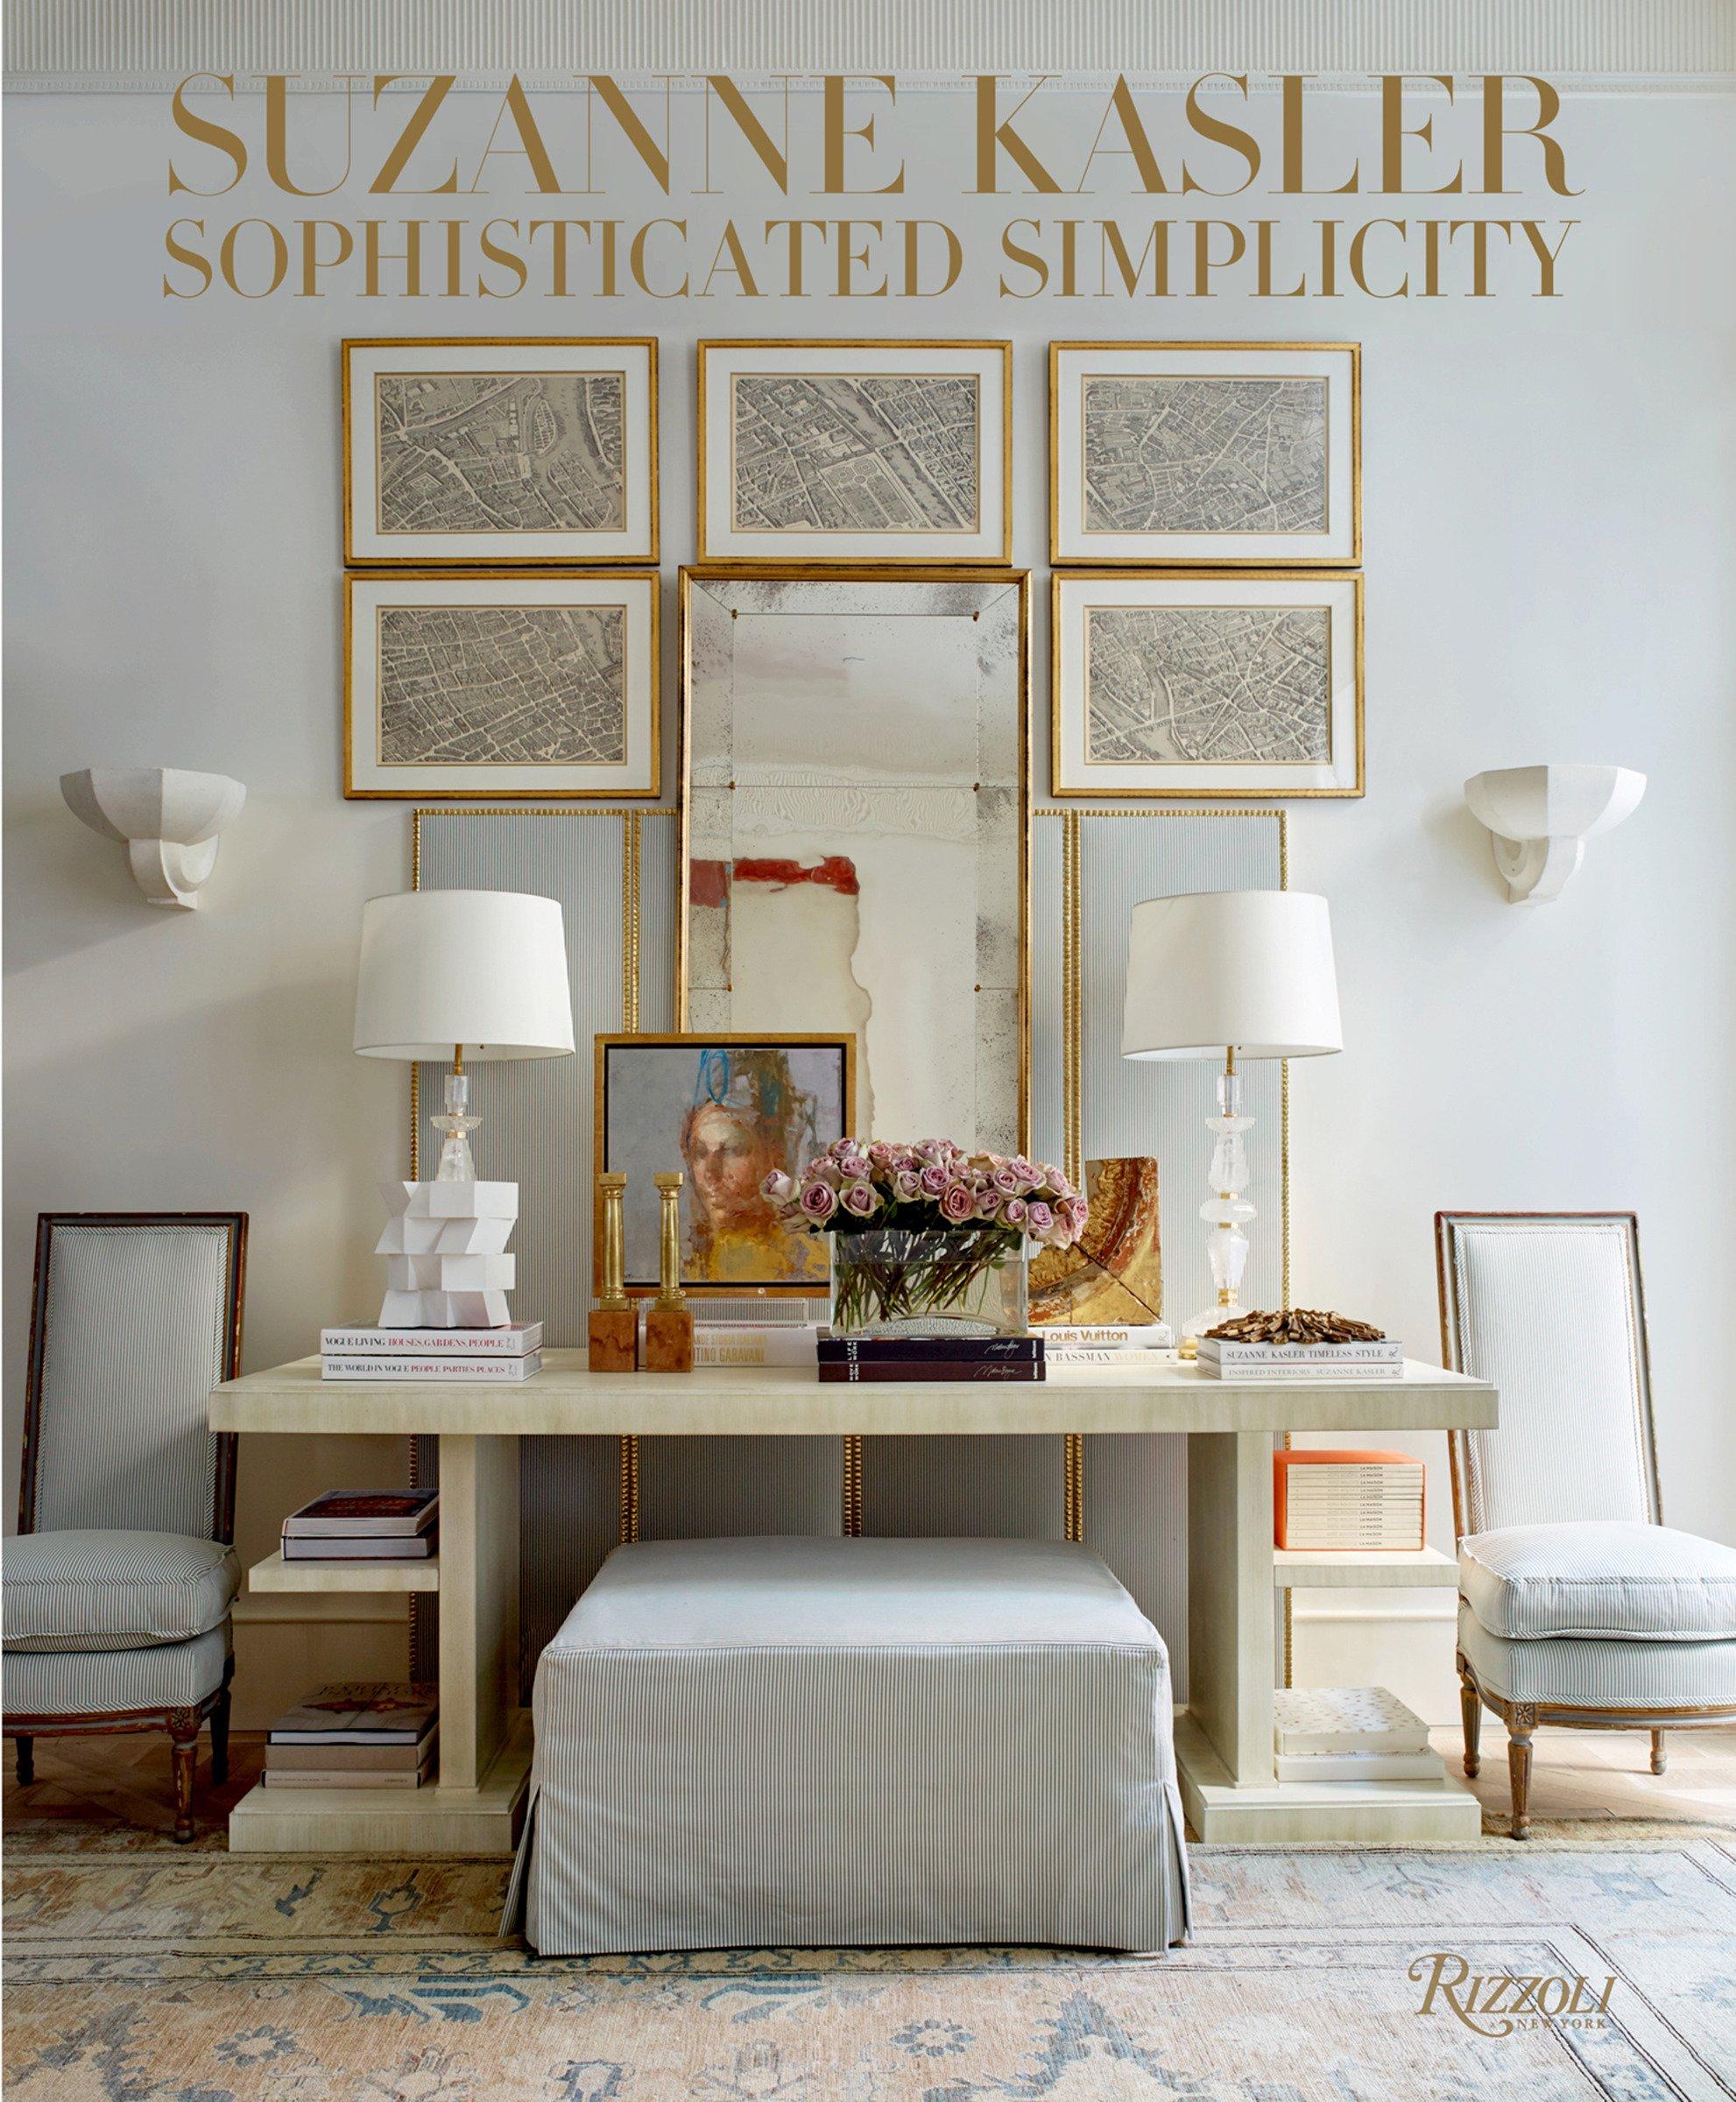 Suzanne Kasler: Sophisticated Simplicity: Suzanne Kasler, Judith Nasitir:  9780847863259: Amazon.com: Books